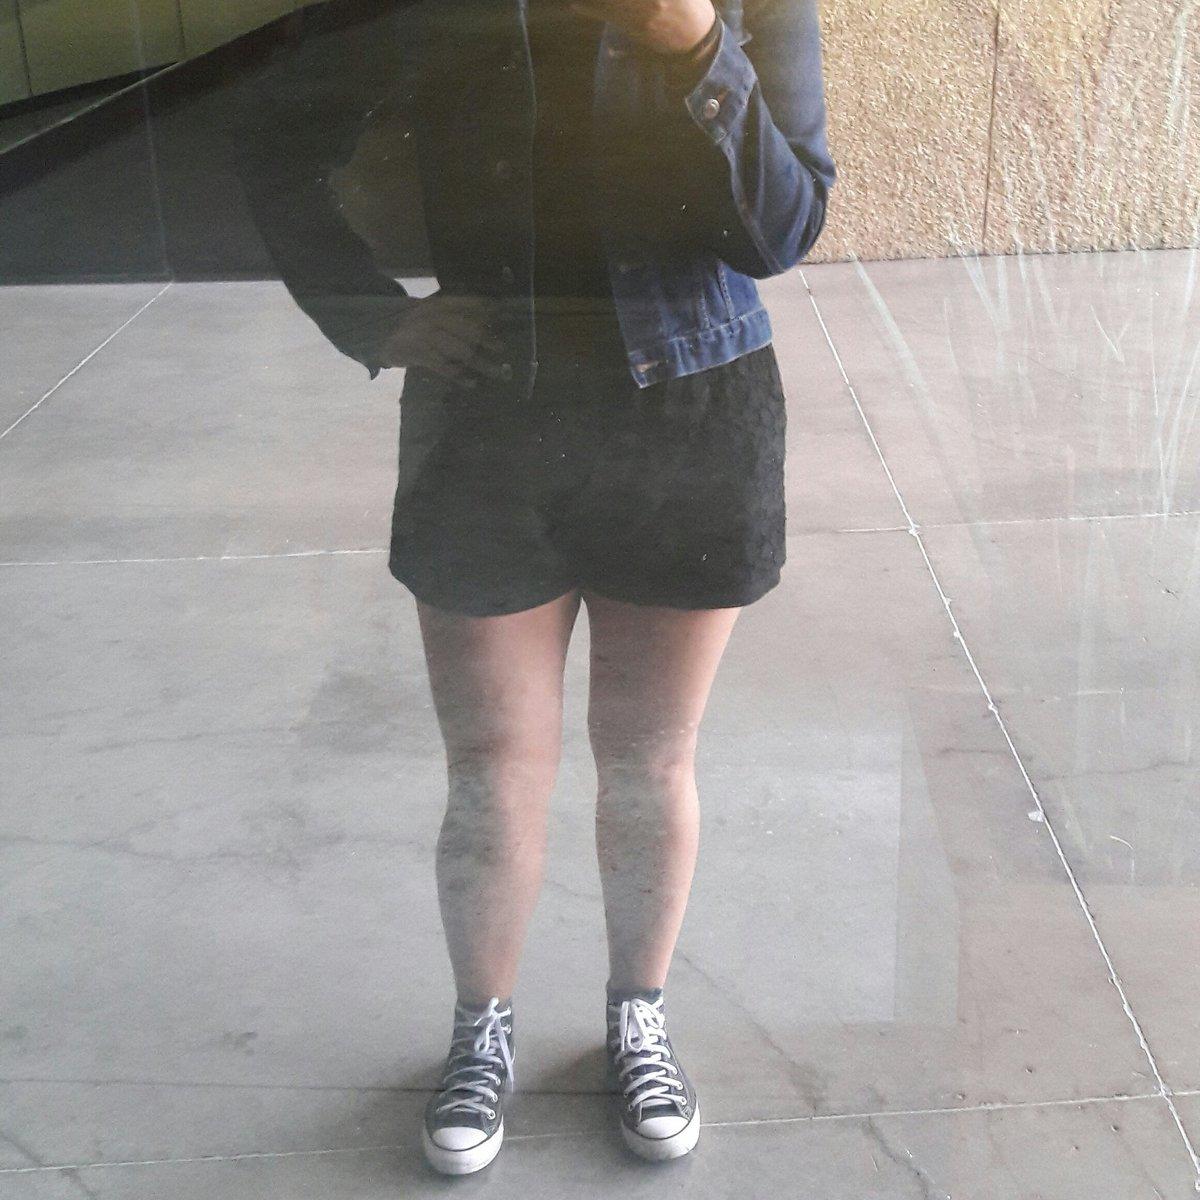 Shameless mirror selfies. twitter.com/JeannyChapeta/…